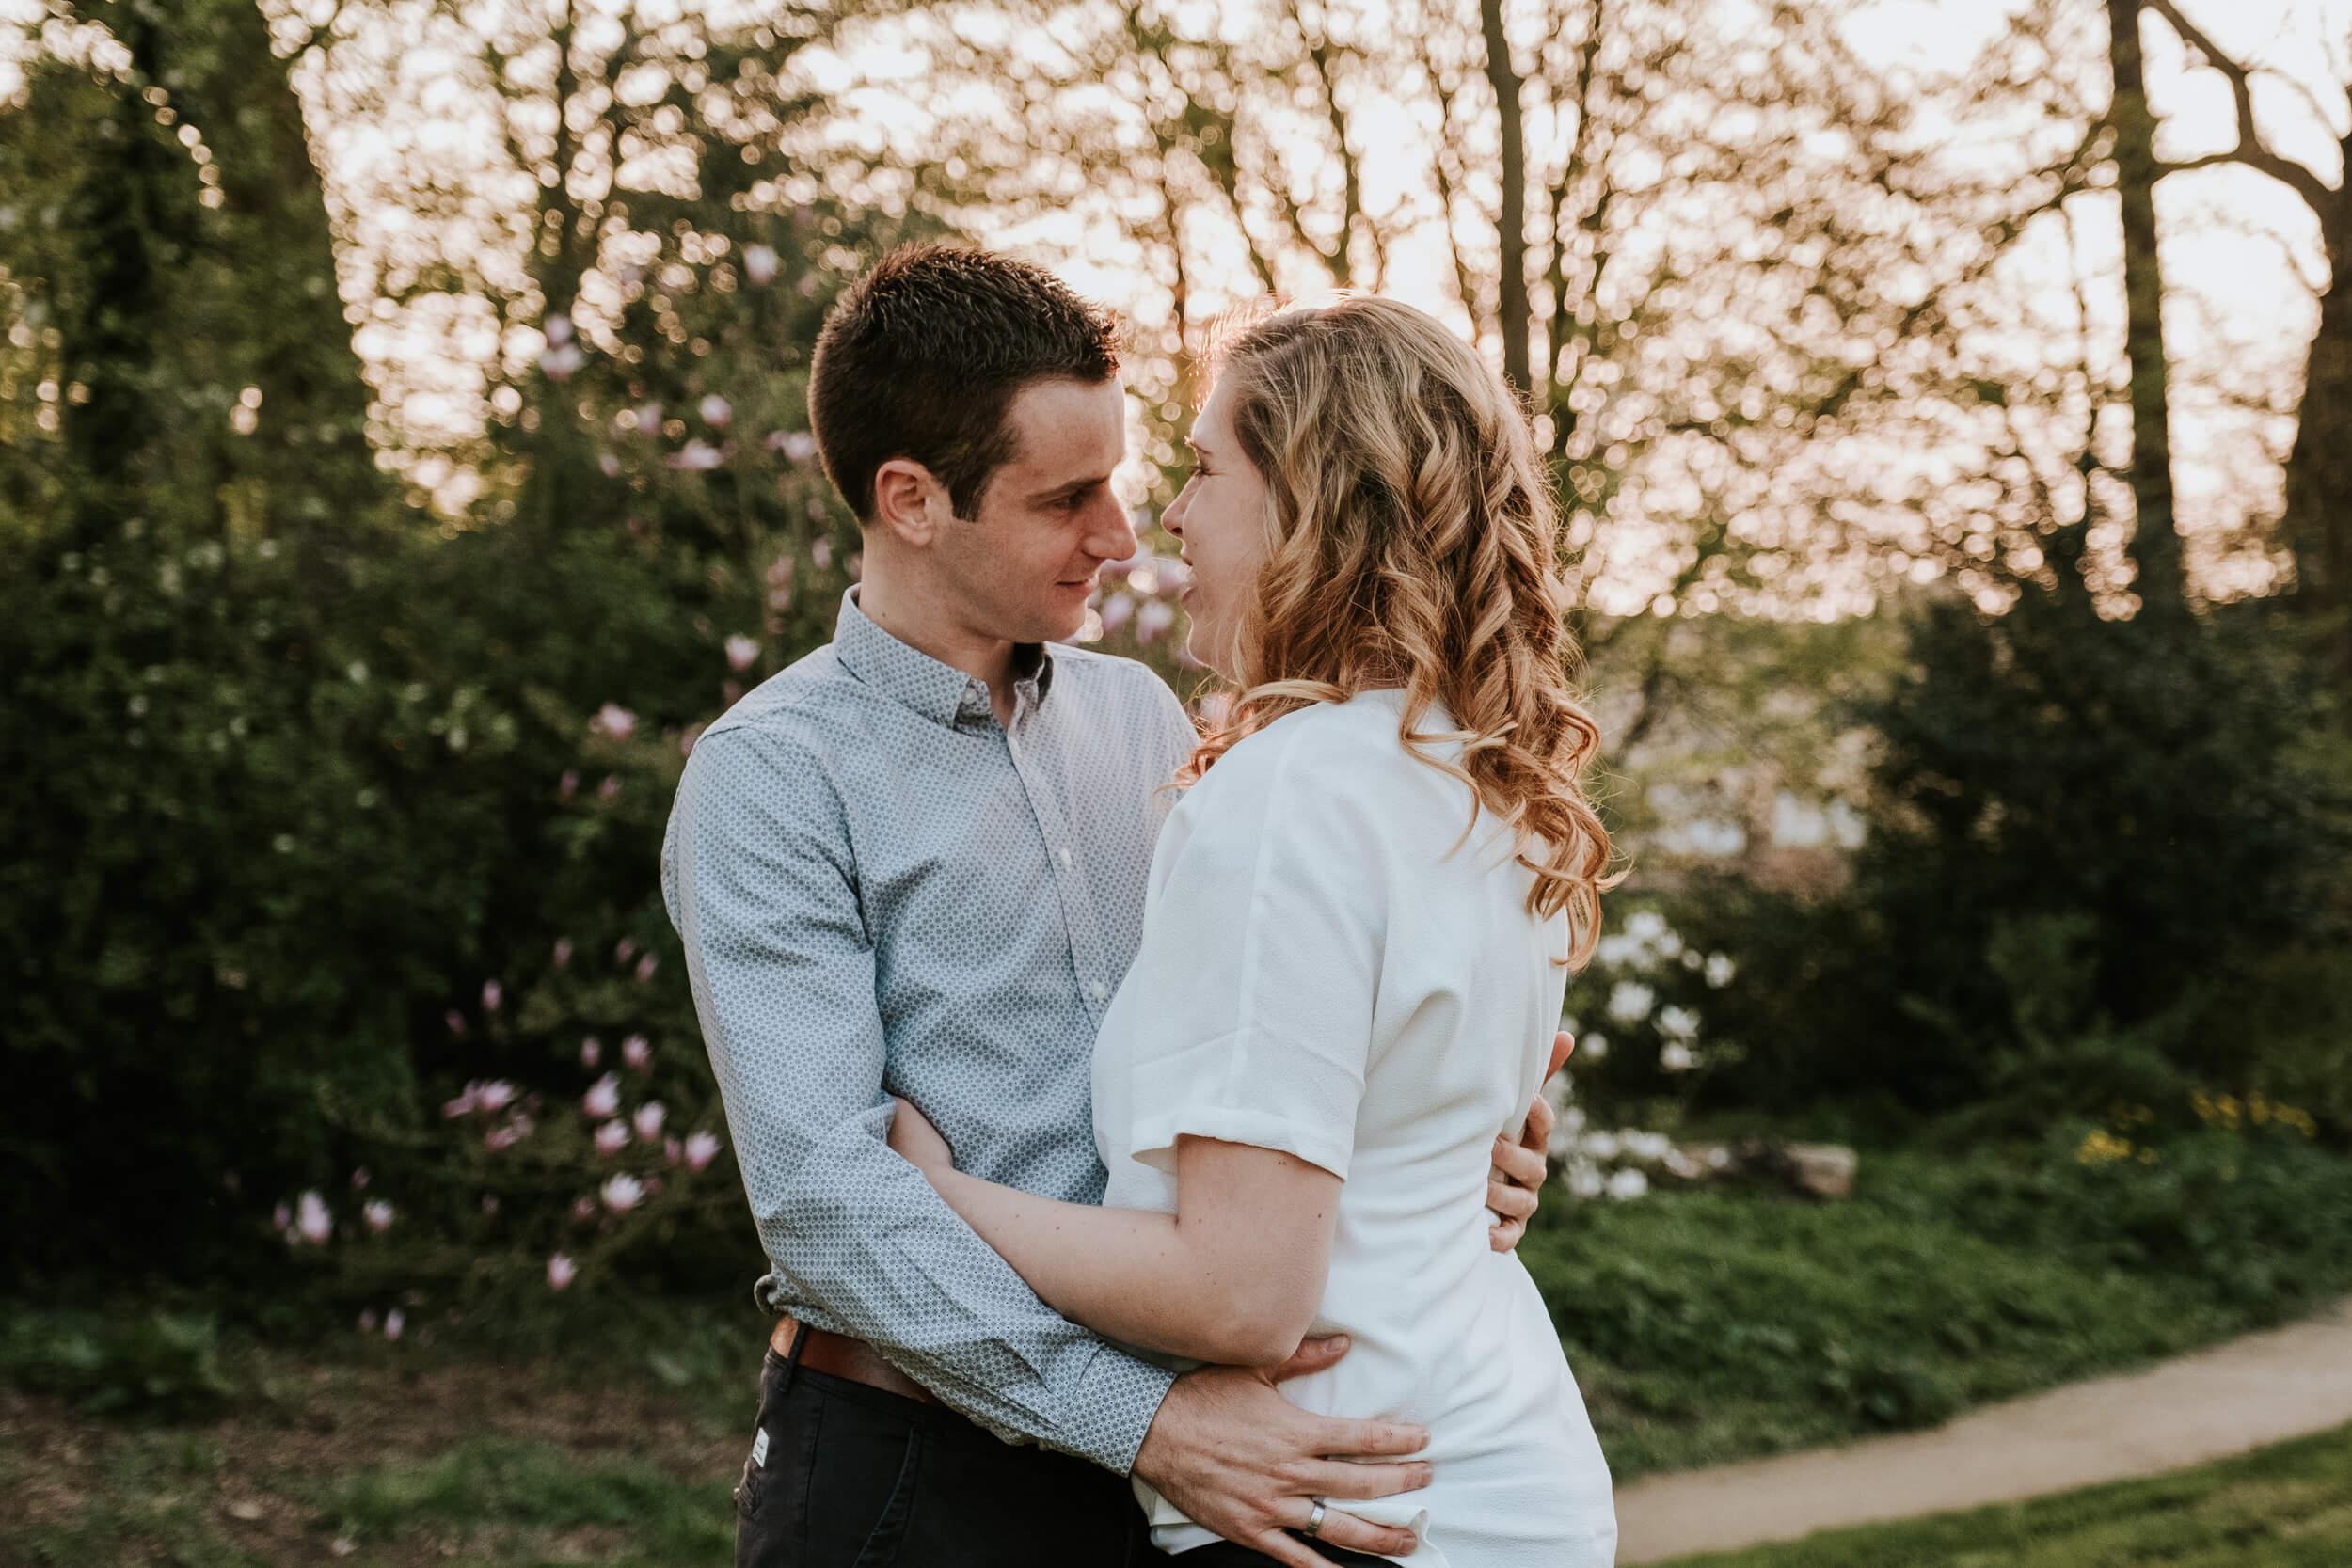 Verloving-Engagement-Vlooybergtoren-Hoegaarden-Tielt-Alternatief-20.JPG